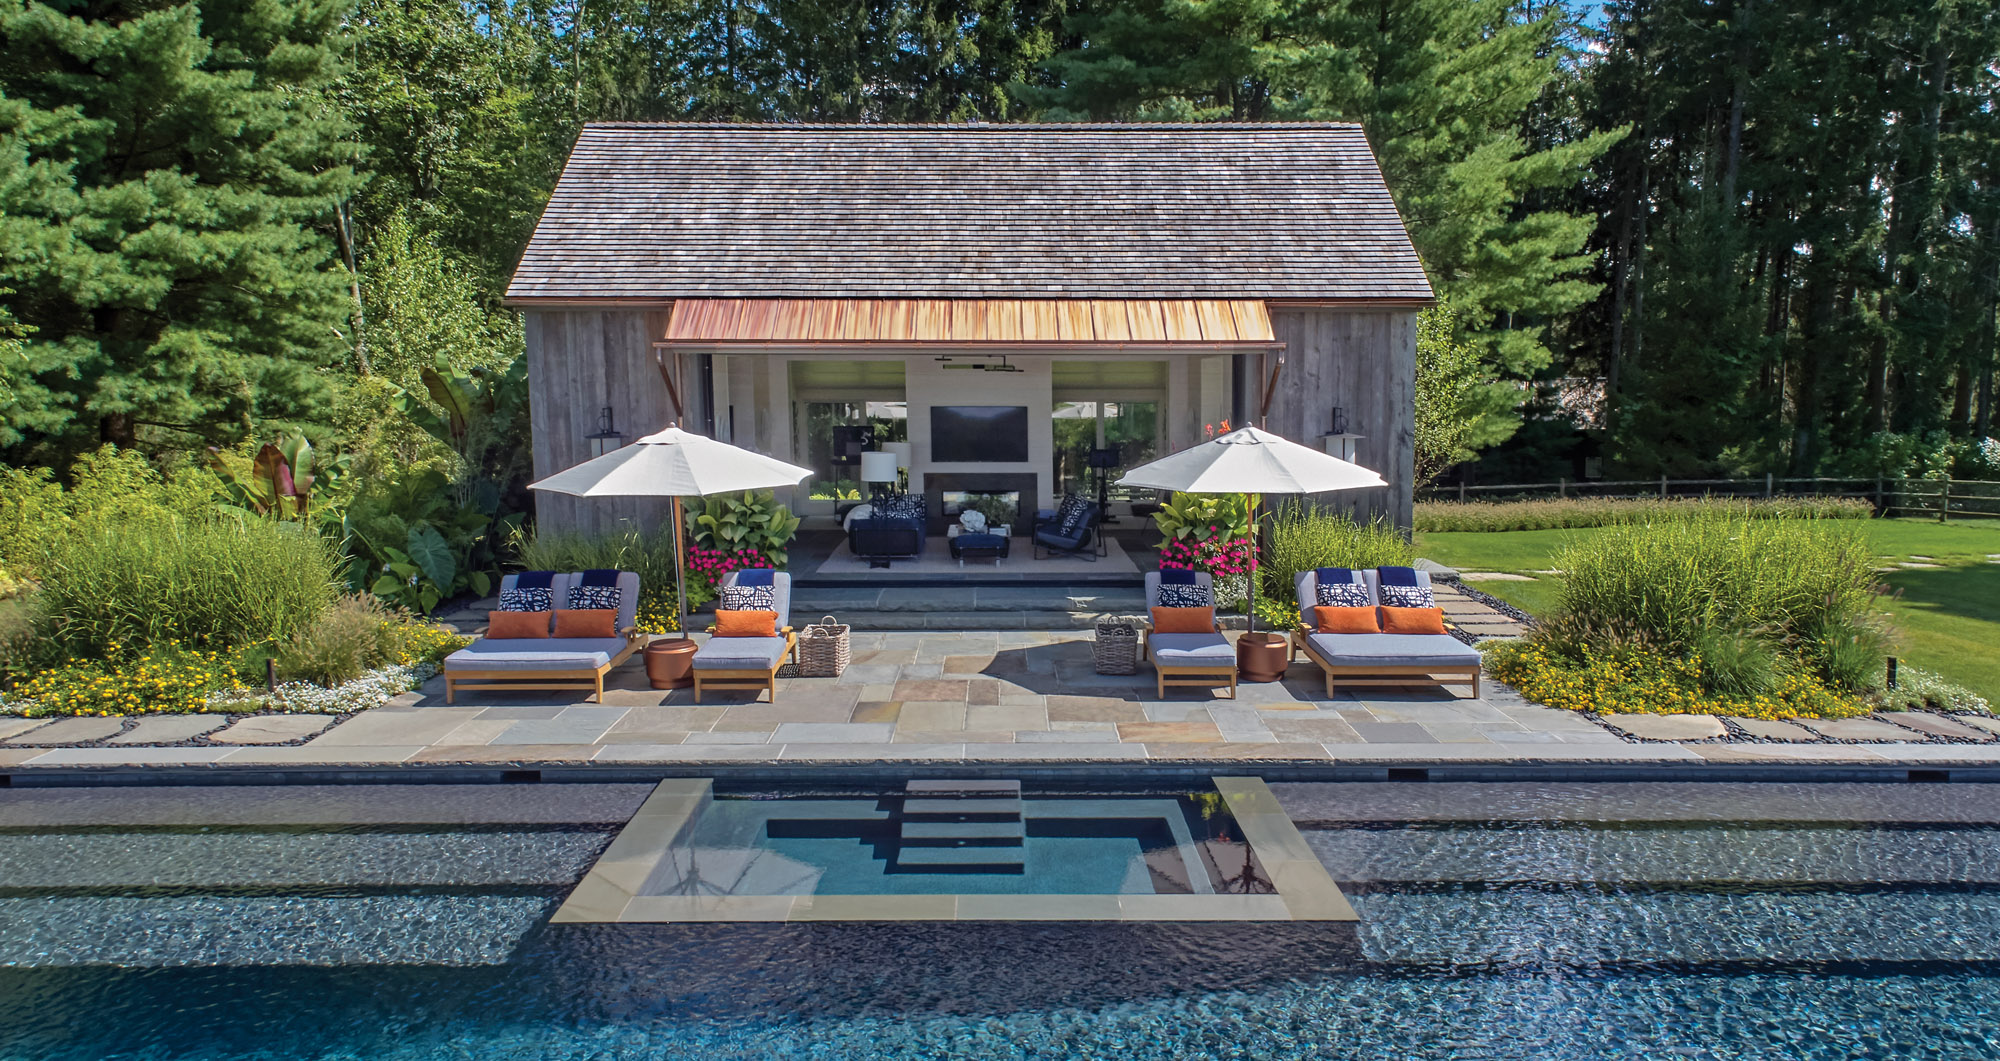 open-air pavilion pool house